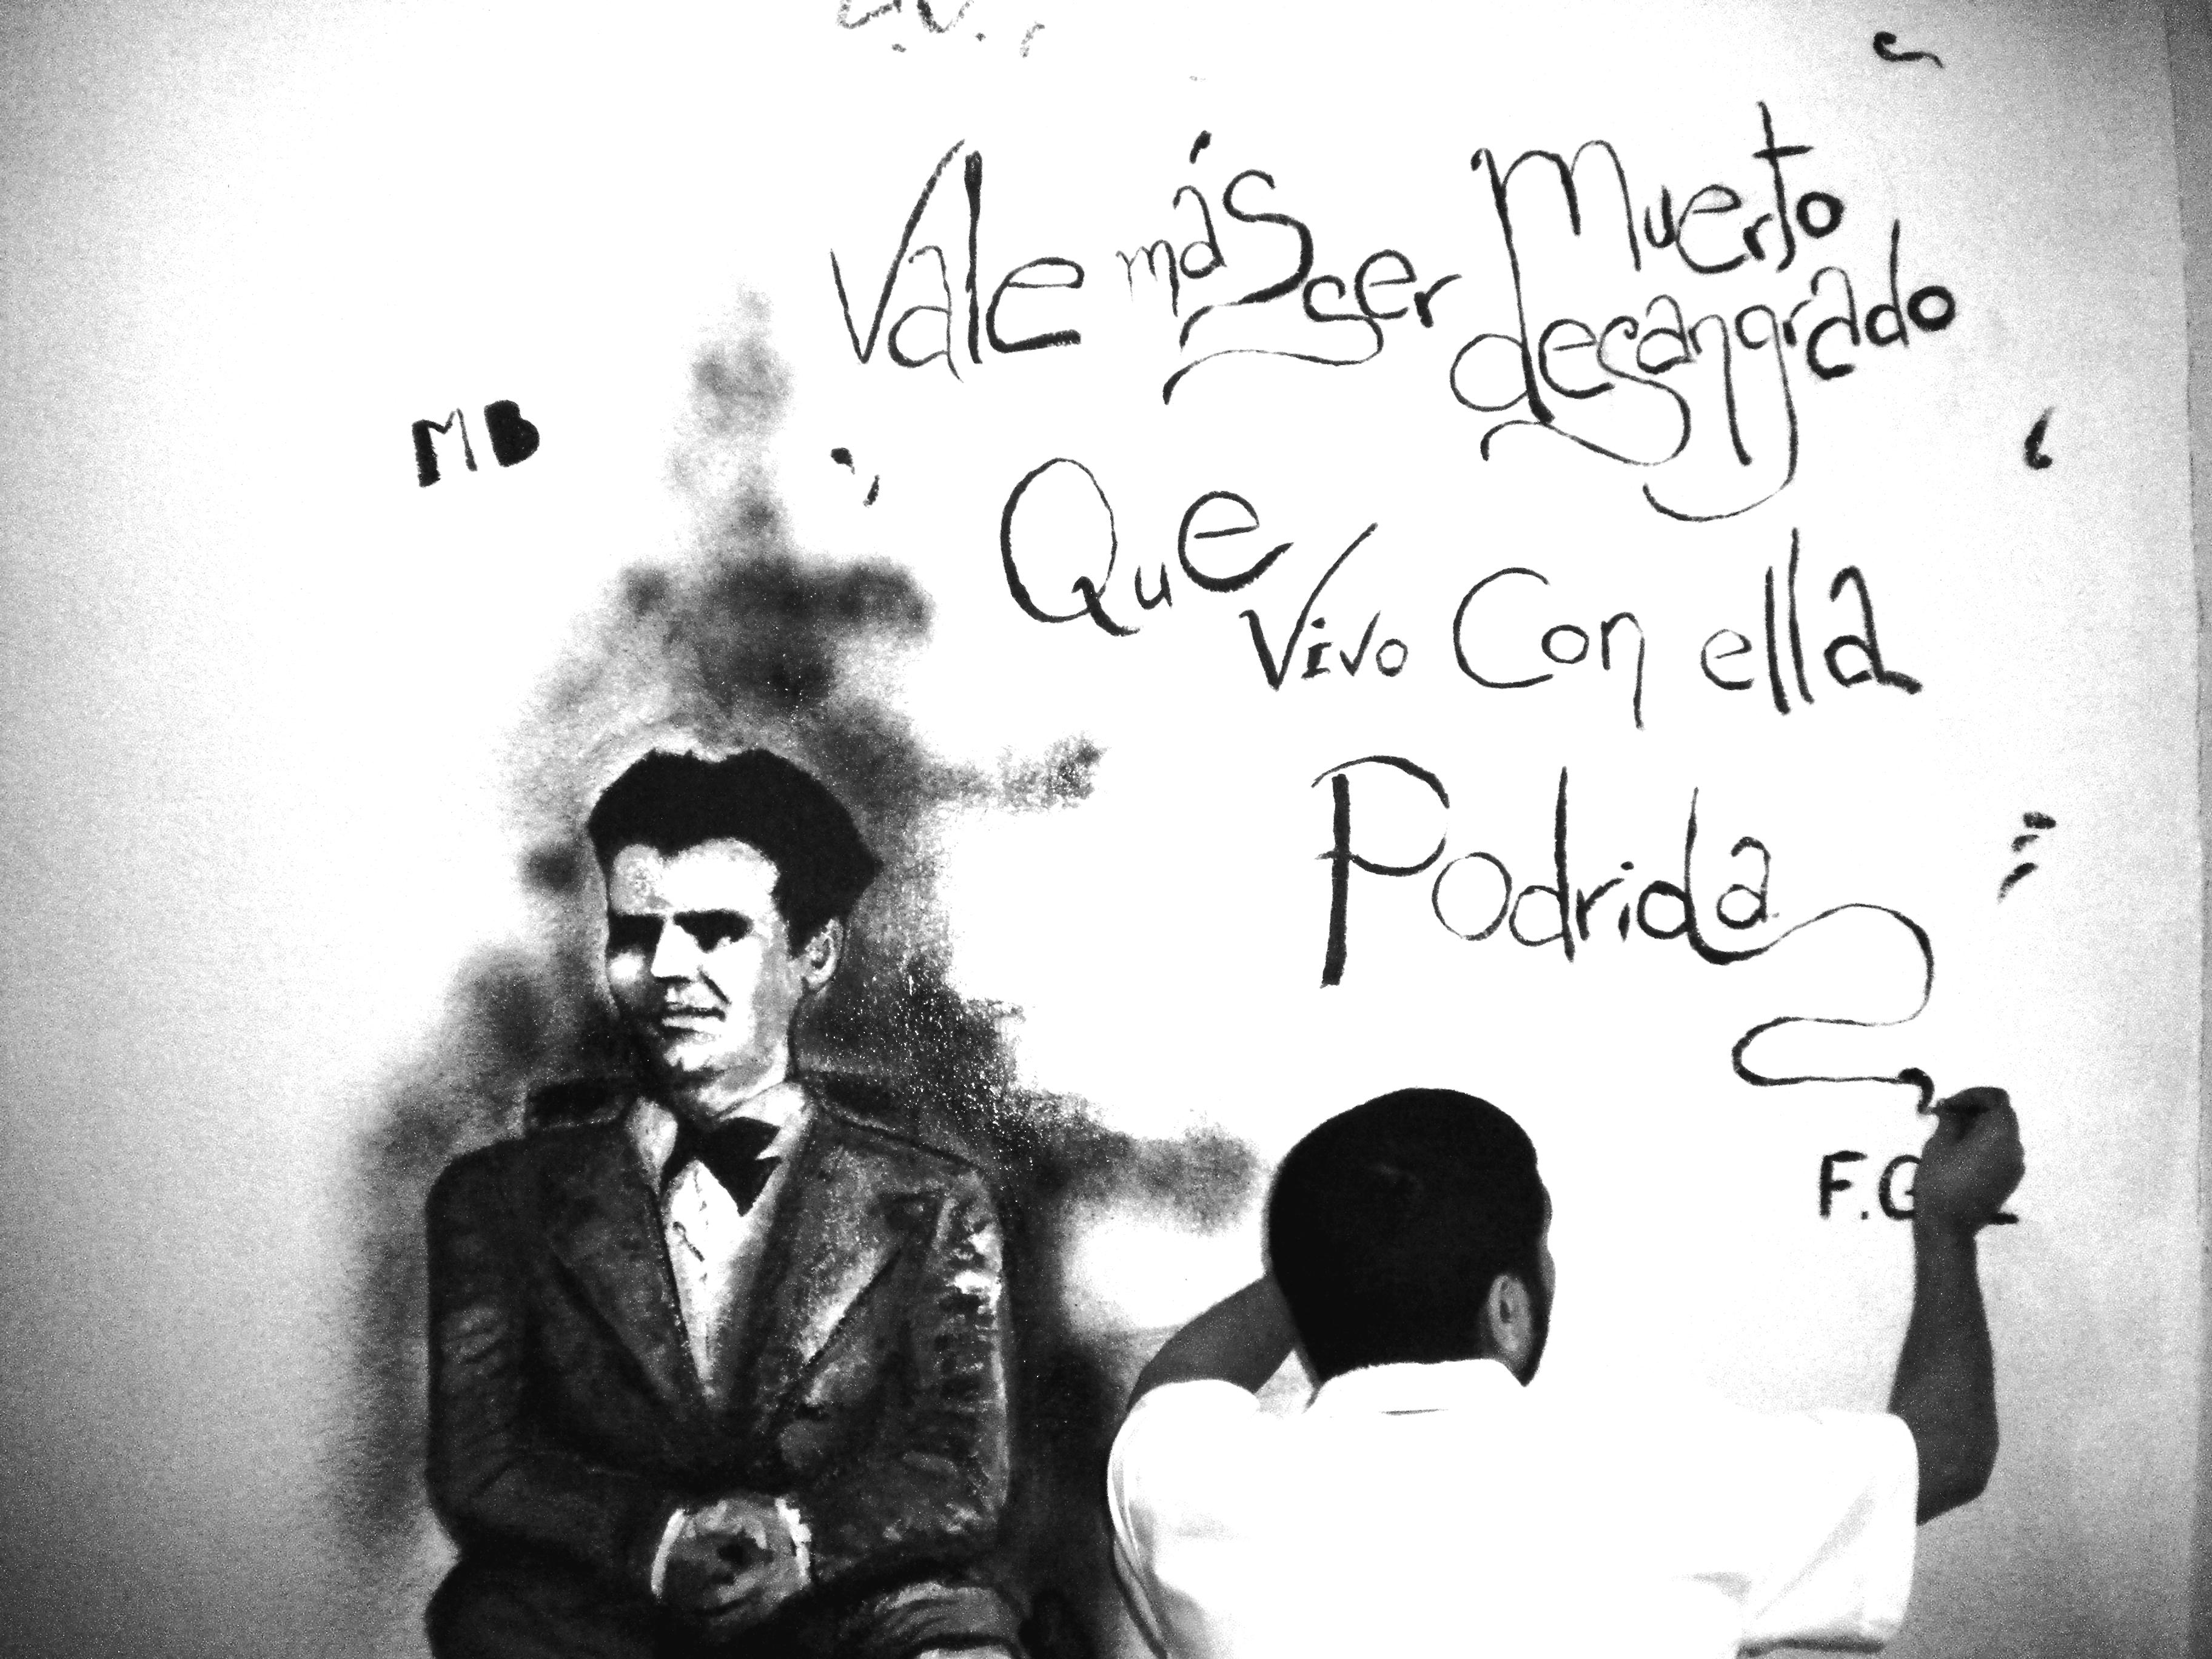 DSCN4798. Mural en honor a Federico García